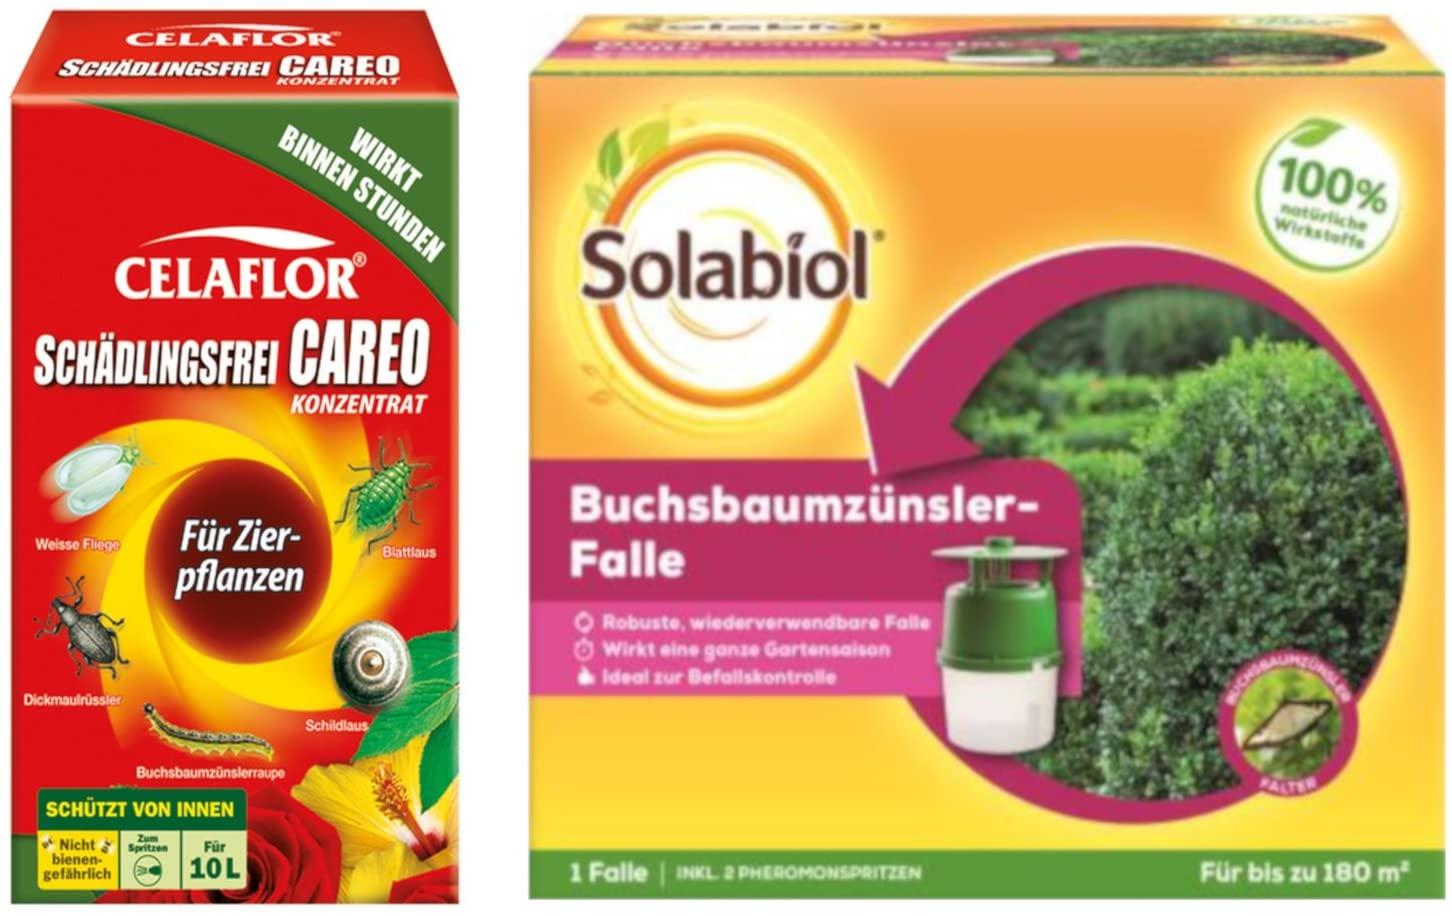 Solabiol Buchsbaumzünslerfalle 1 Stück + Celaflor Schädlingsfrei CAREO Konzentrat Zierpflanzen 100 ml